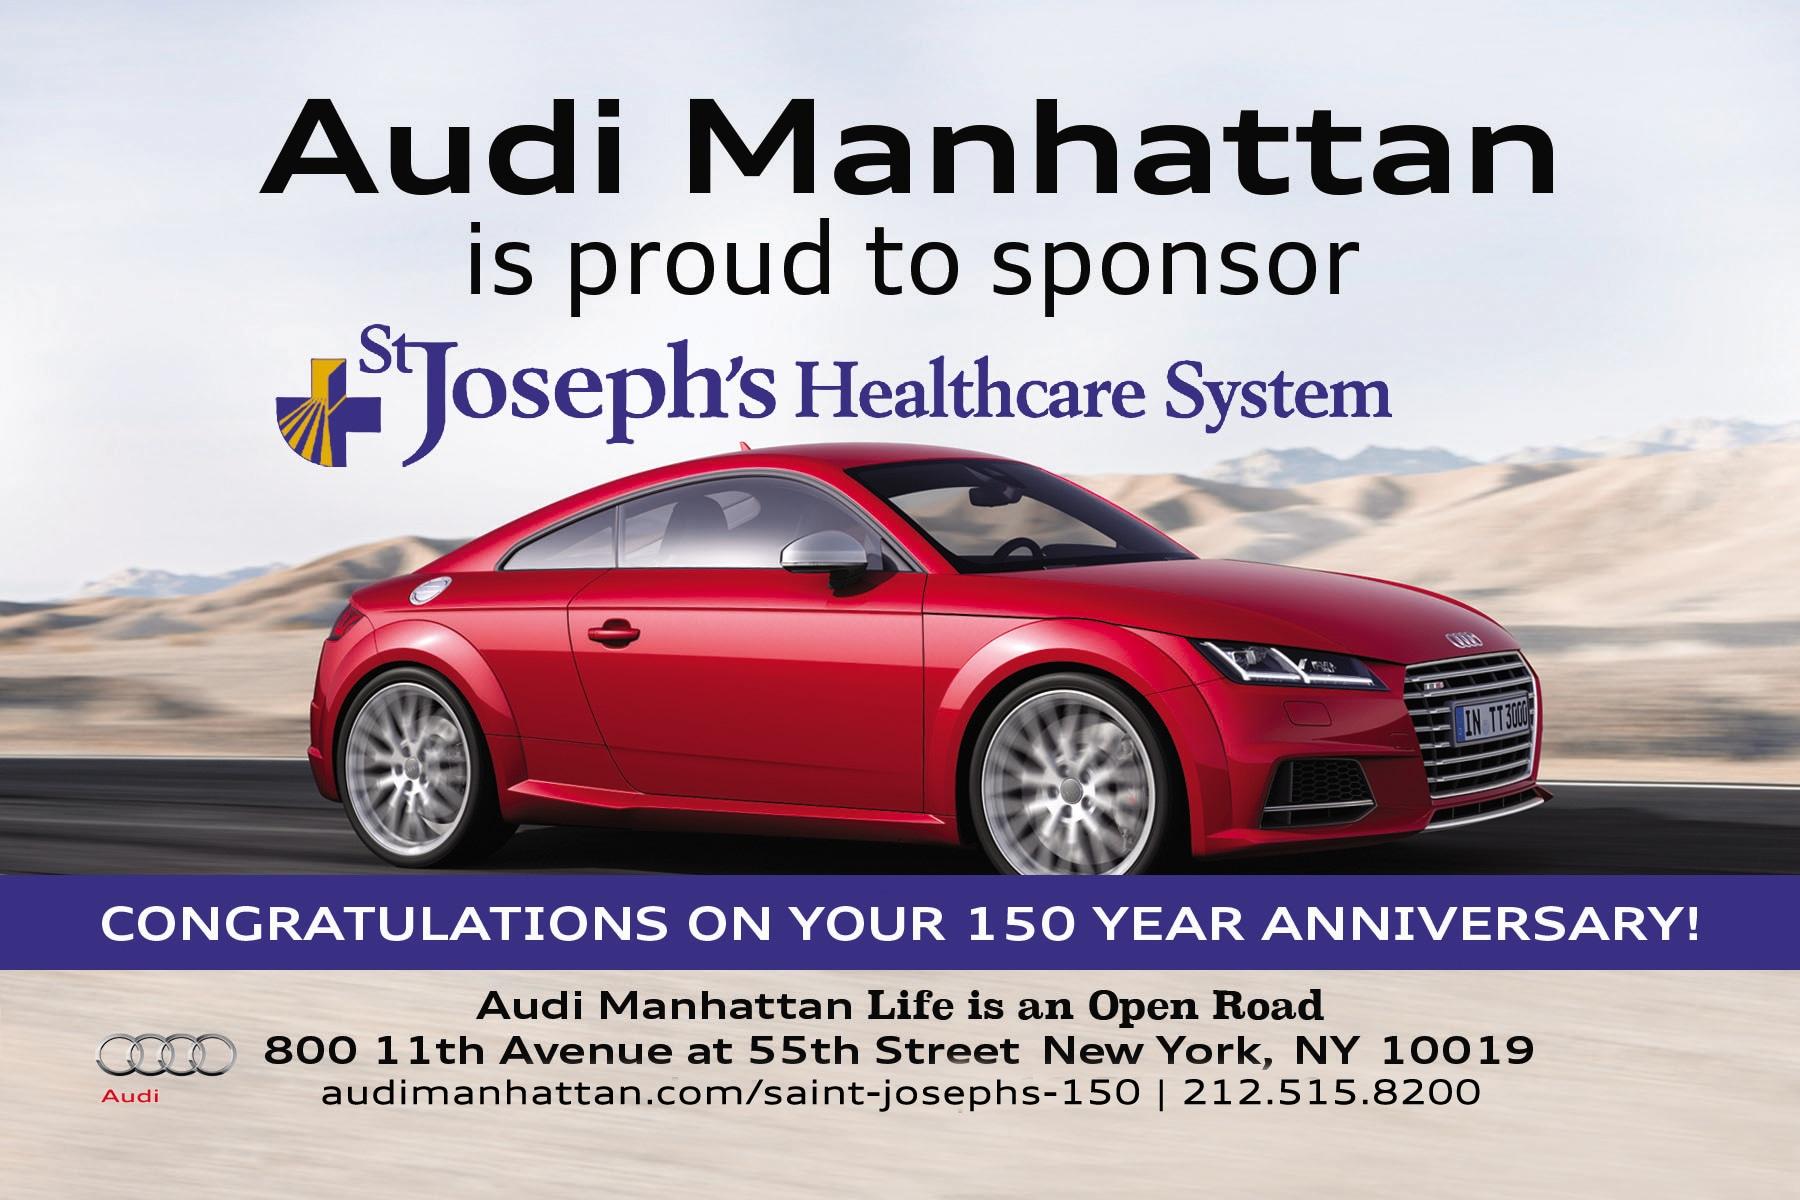 Audi Manhattan New Audi Dealership In New York NY - Audi dealers ny